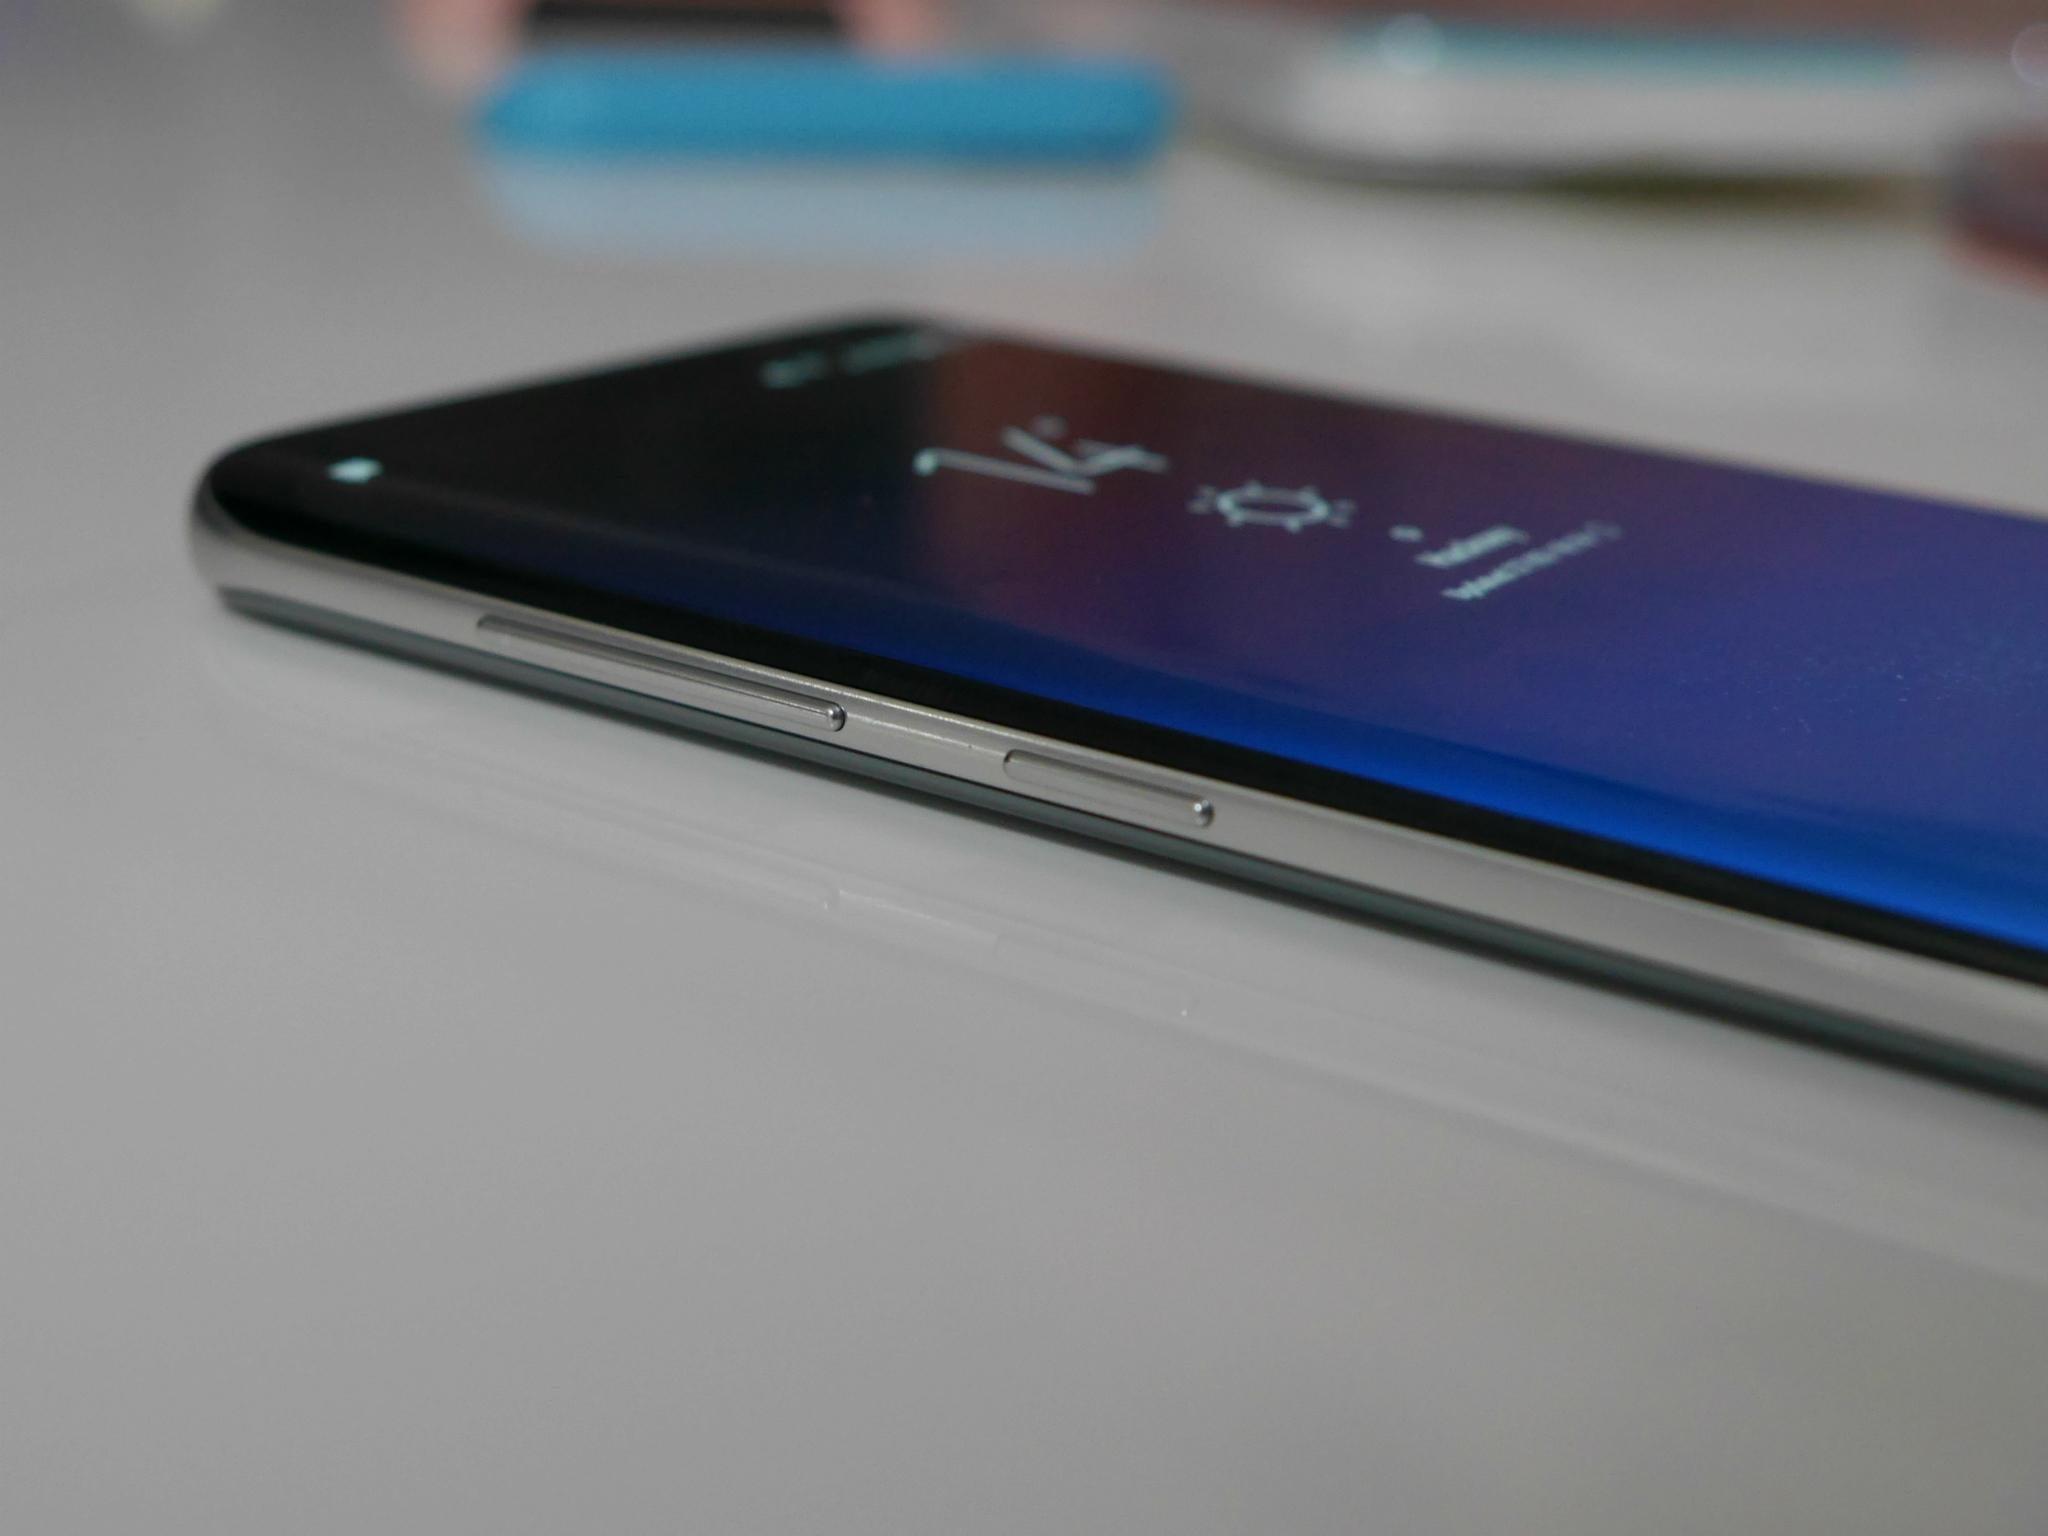 Samsung Galaxy S8 to get Portrait Mode in next software